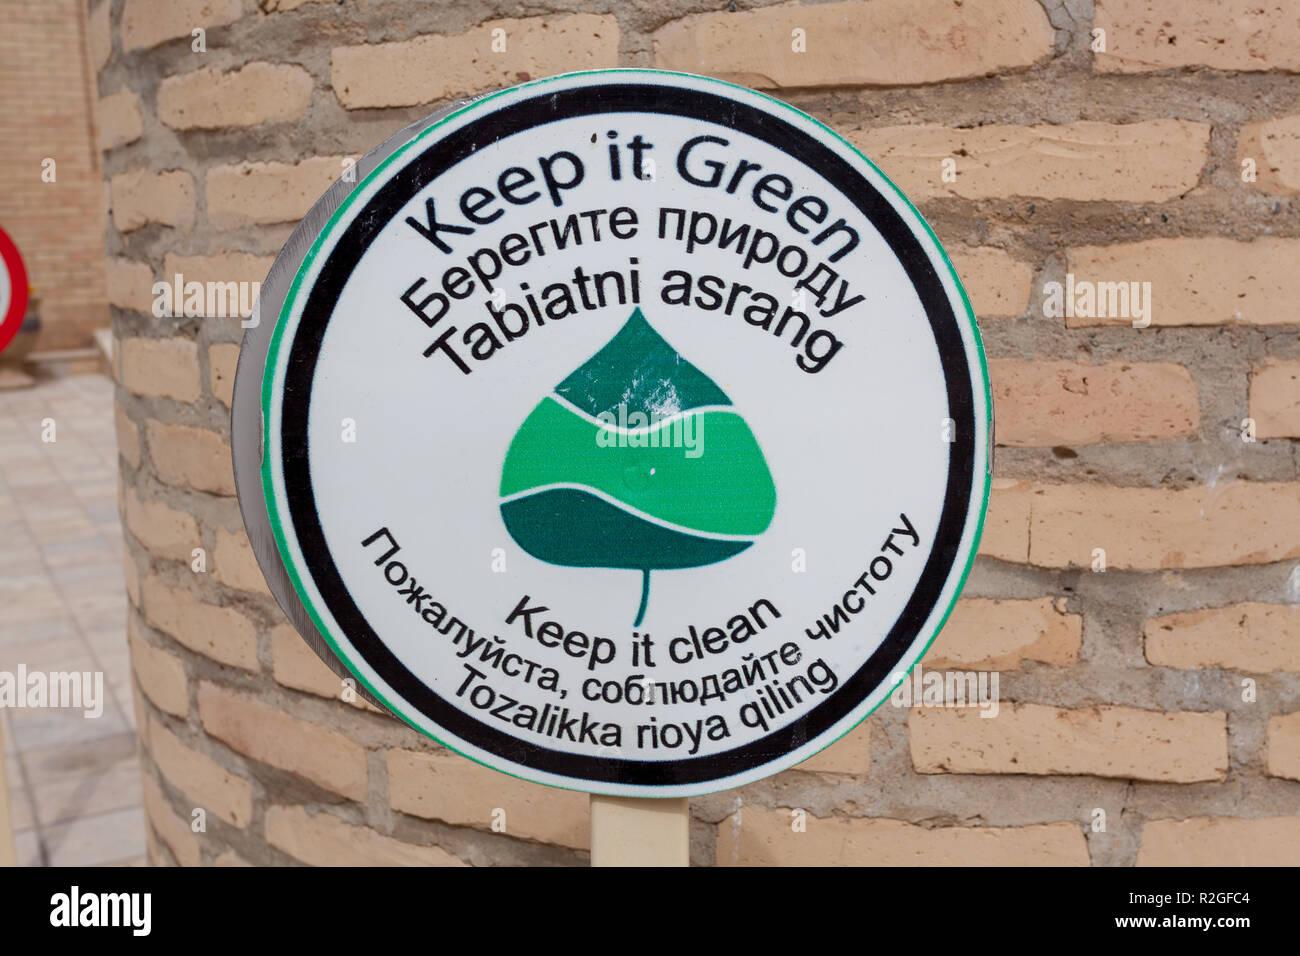 Keep it Green sign, Shahrisabz, Uzbekistan - Stock Image